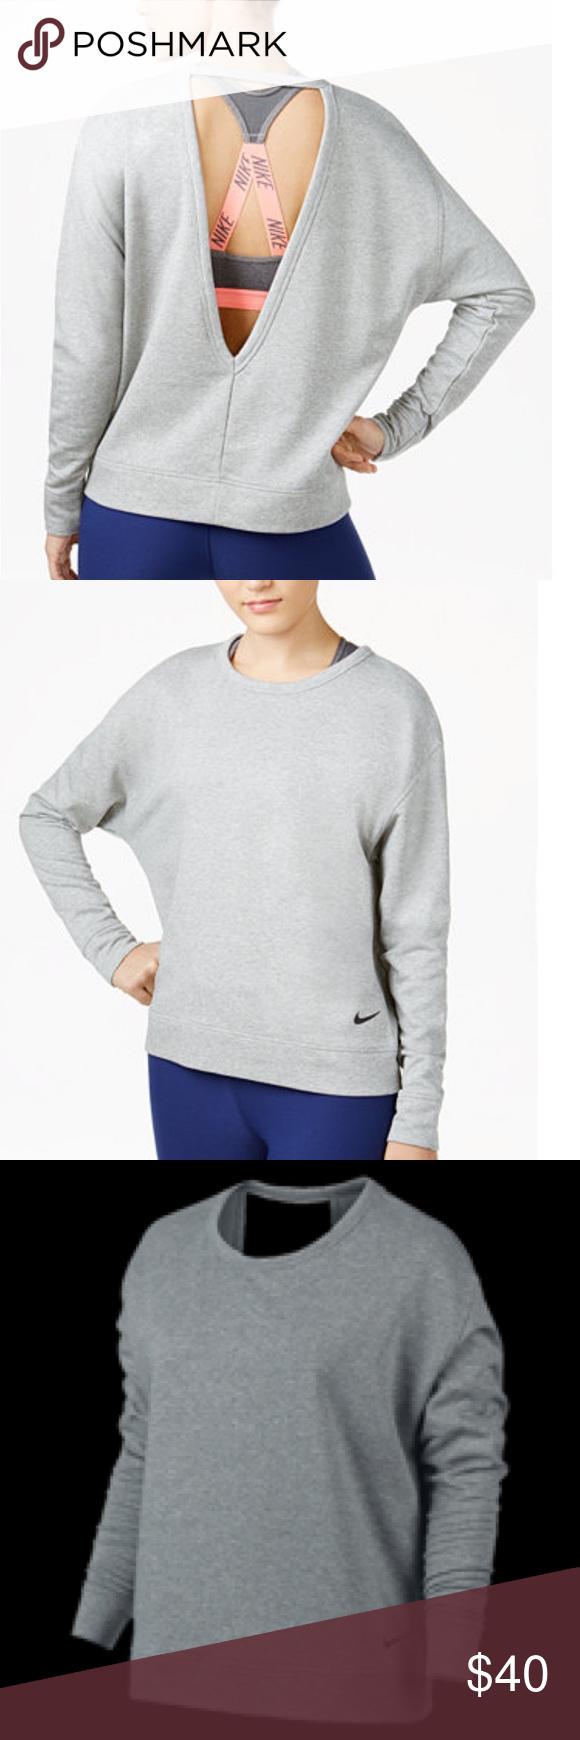 Nike Women S Dry Top Versa Open Back Sweater Fabric 100 Polyester Fit Loose Dri Fit Fabric Wicks Sweat Away To Keep You Feeli Training Tops Tops Womens Tops [ 1740 x 580 Pixel ]